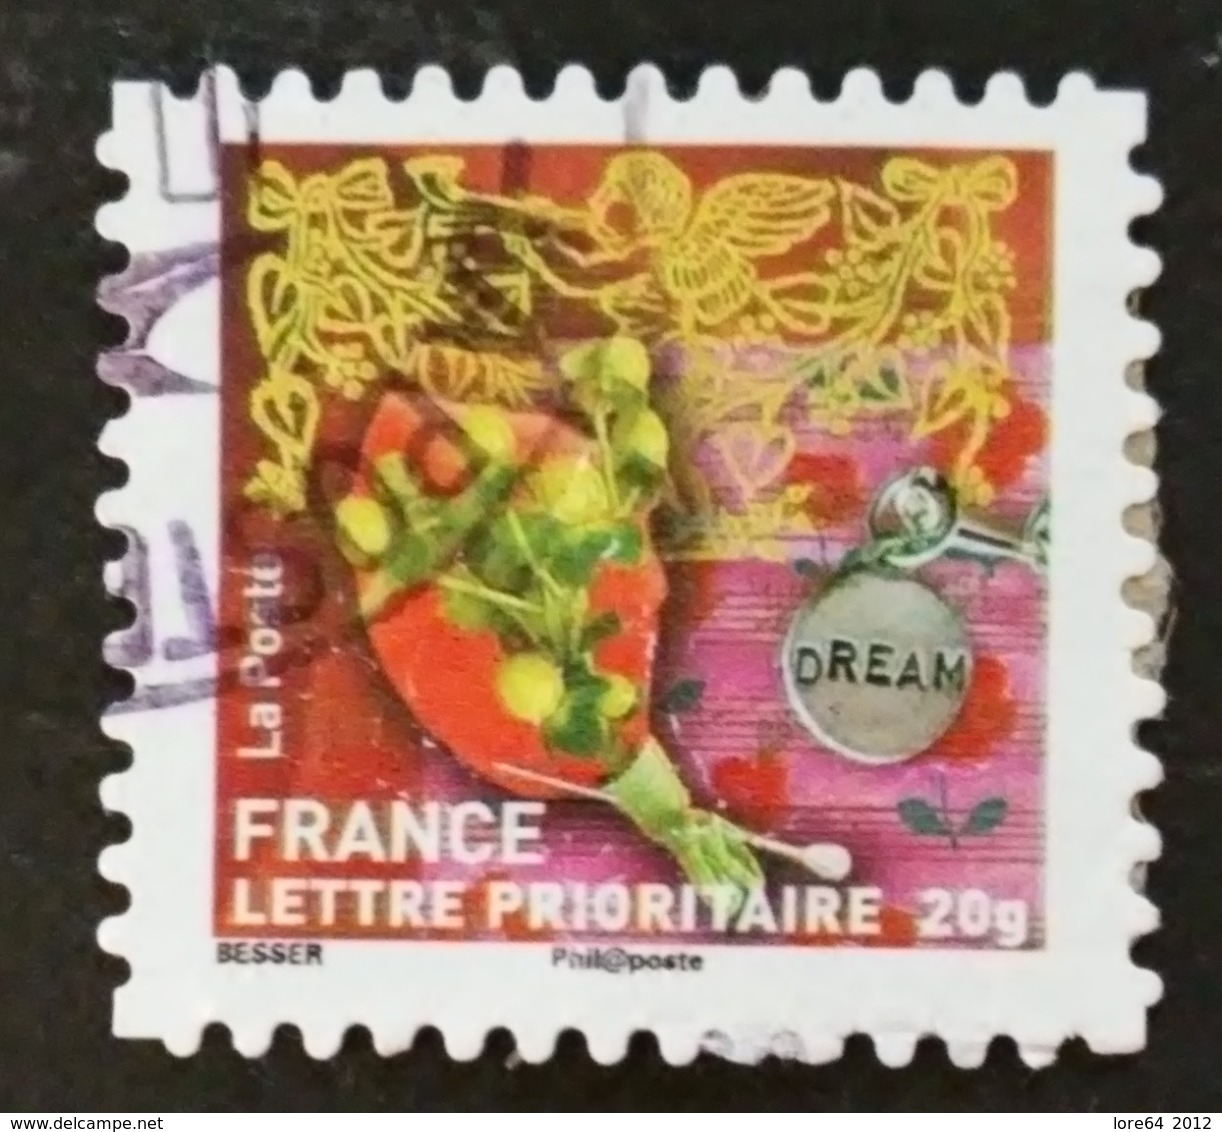 FRANCIA 2010 - 502 - Adhésifs (autocollants)